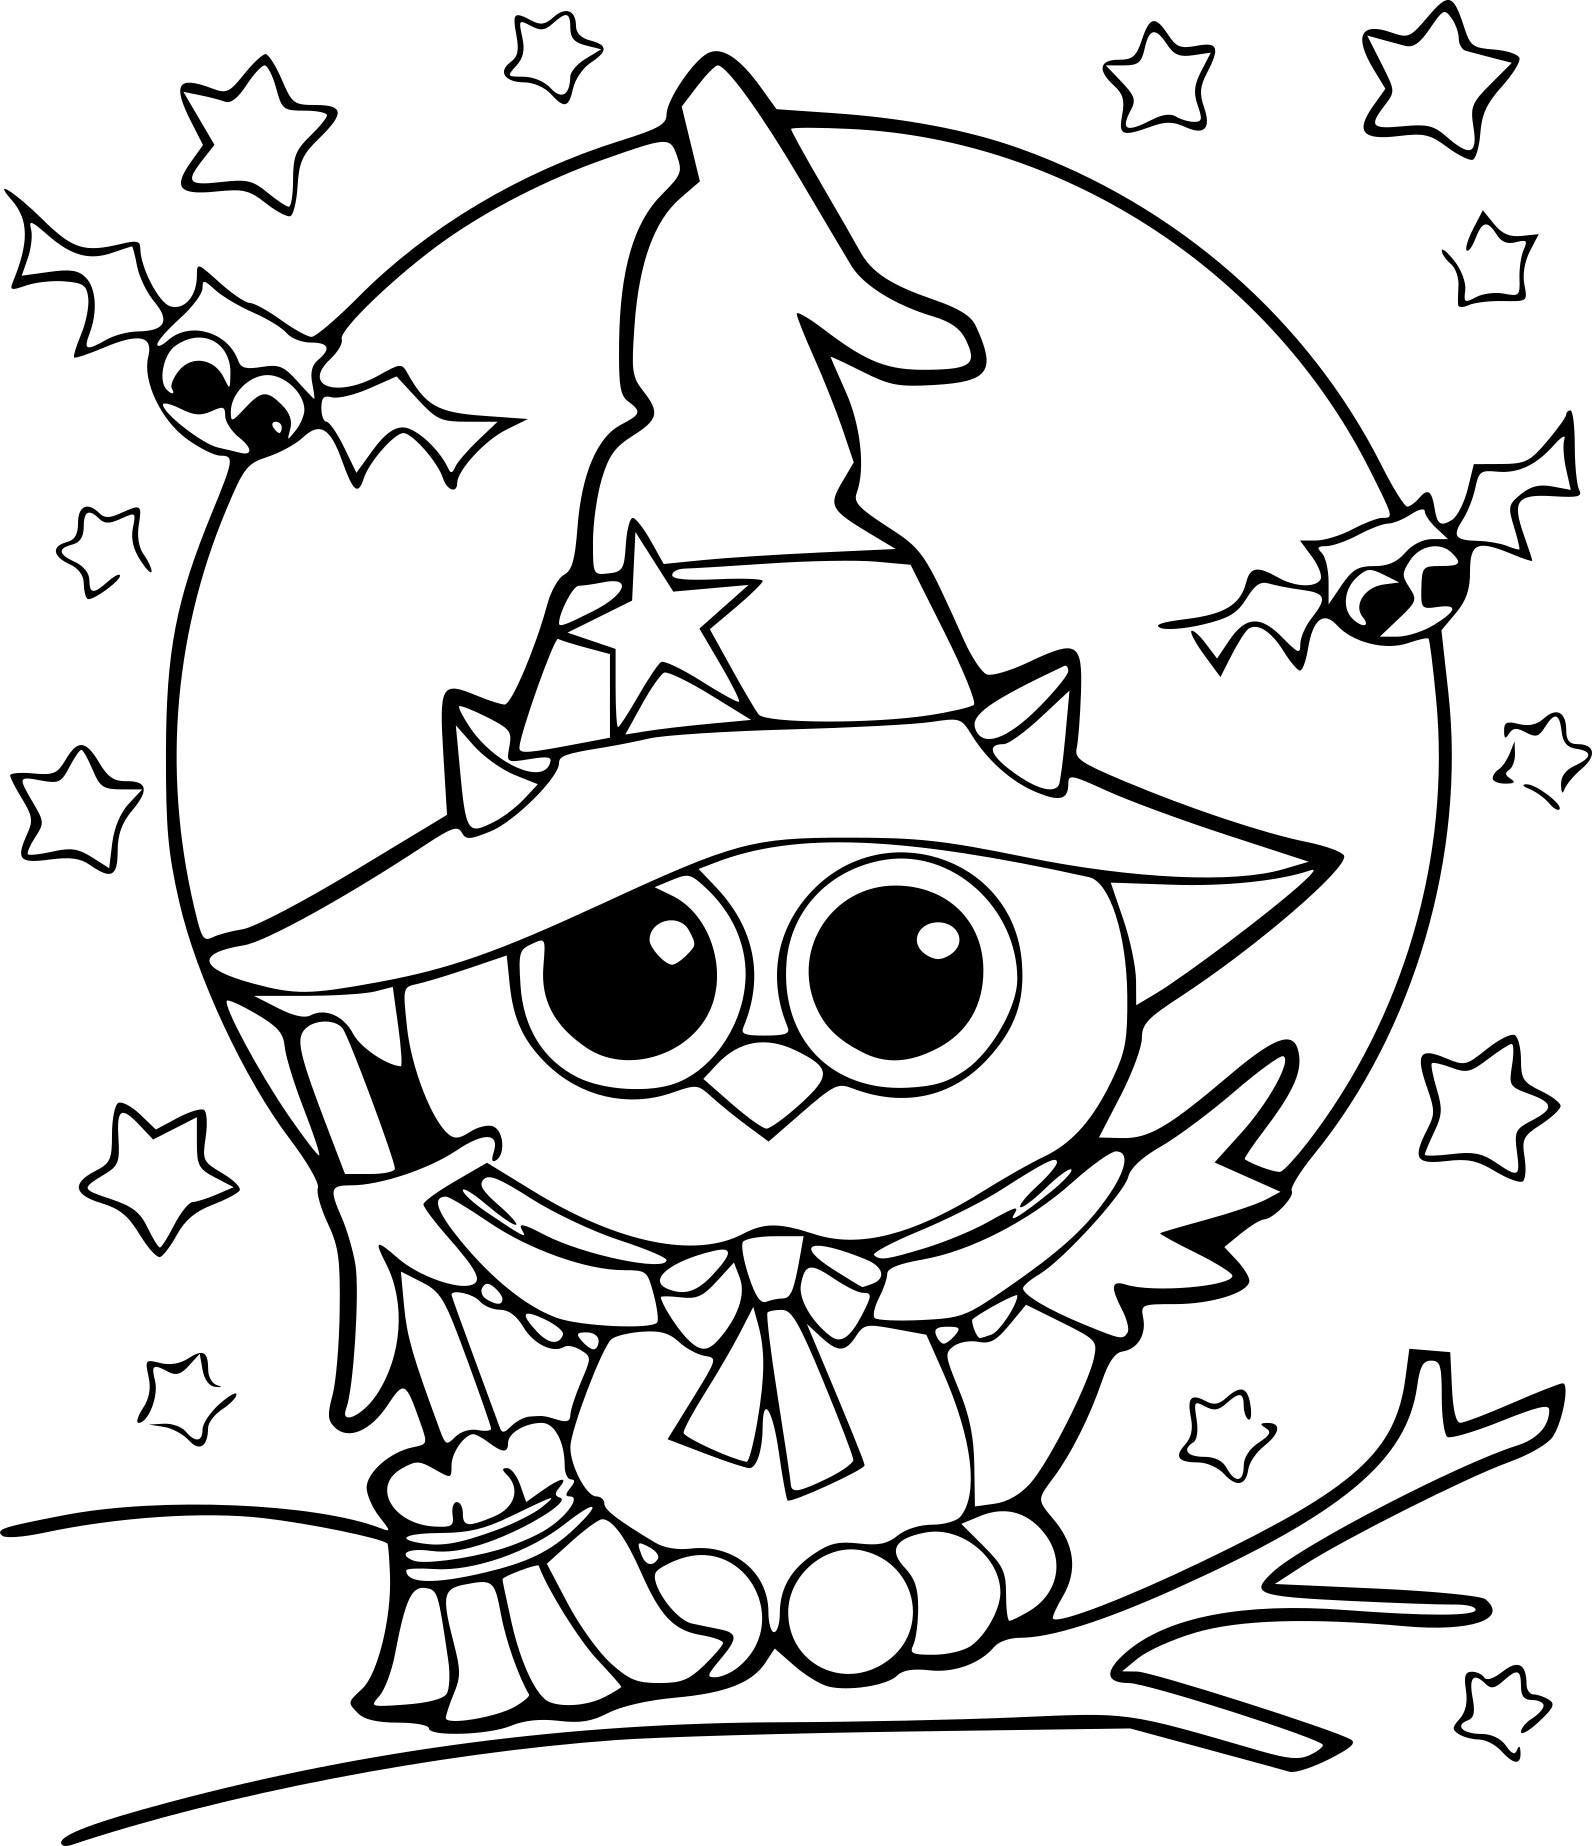 Coloriage Halloween Hibou À Imprimer serapportantà Hibou A Imprimer